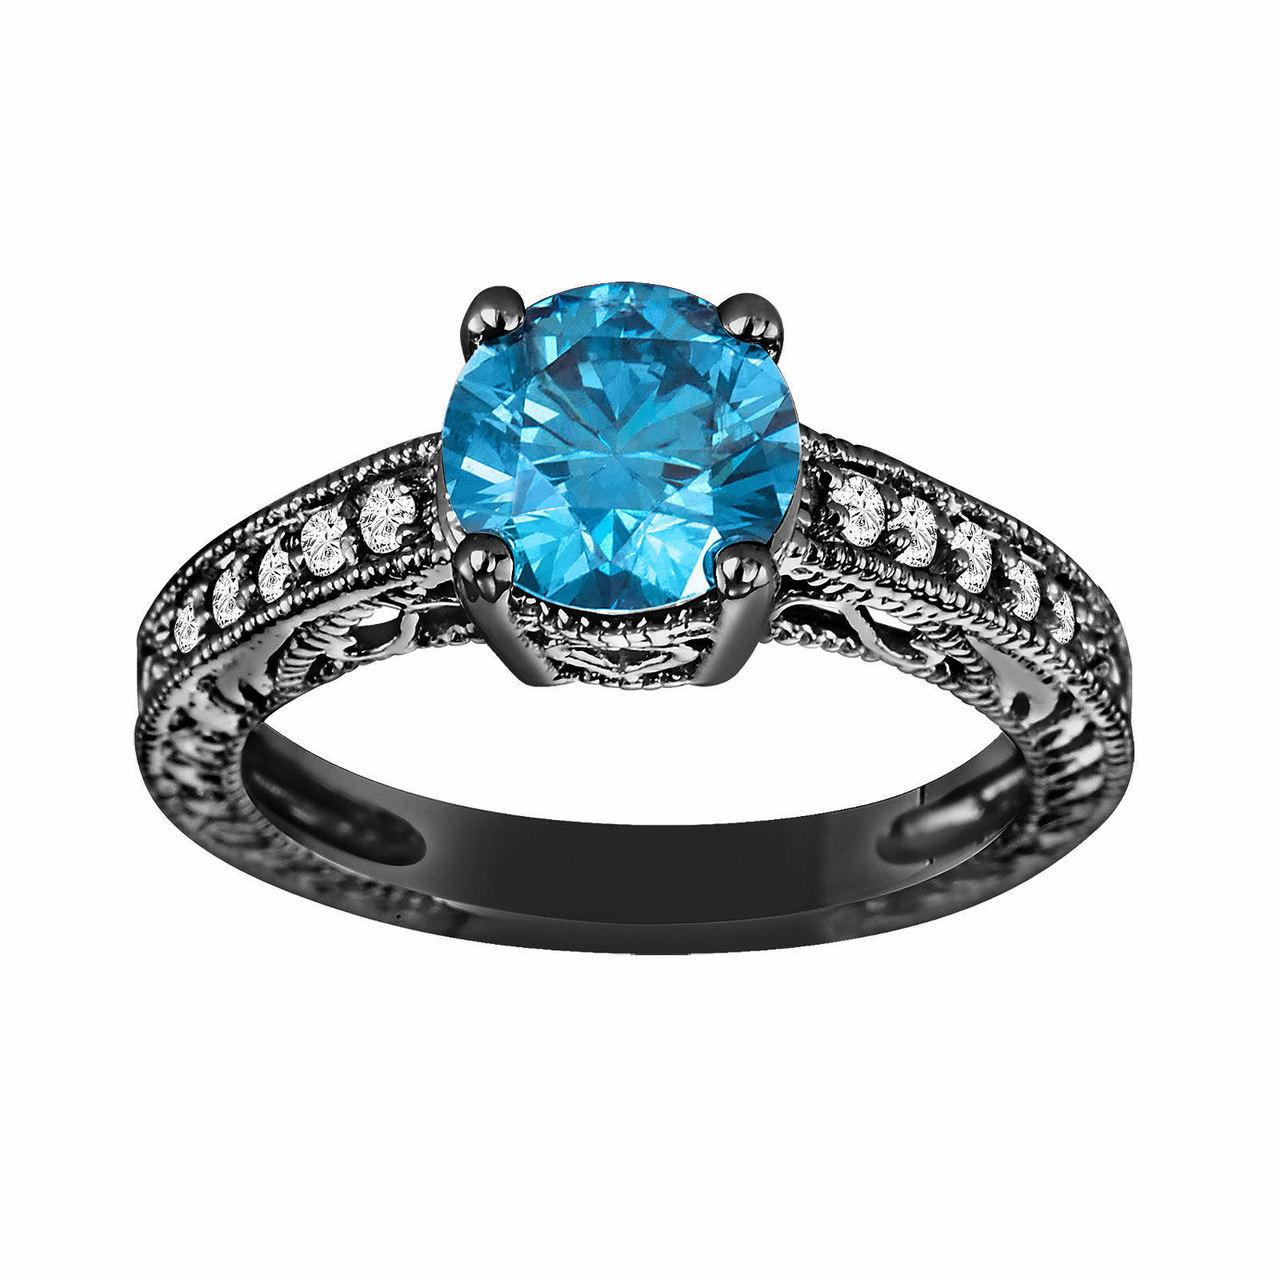 Fancy Blue Amp White Diamond Engagement Ring Vintage Style